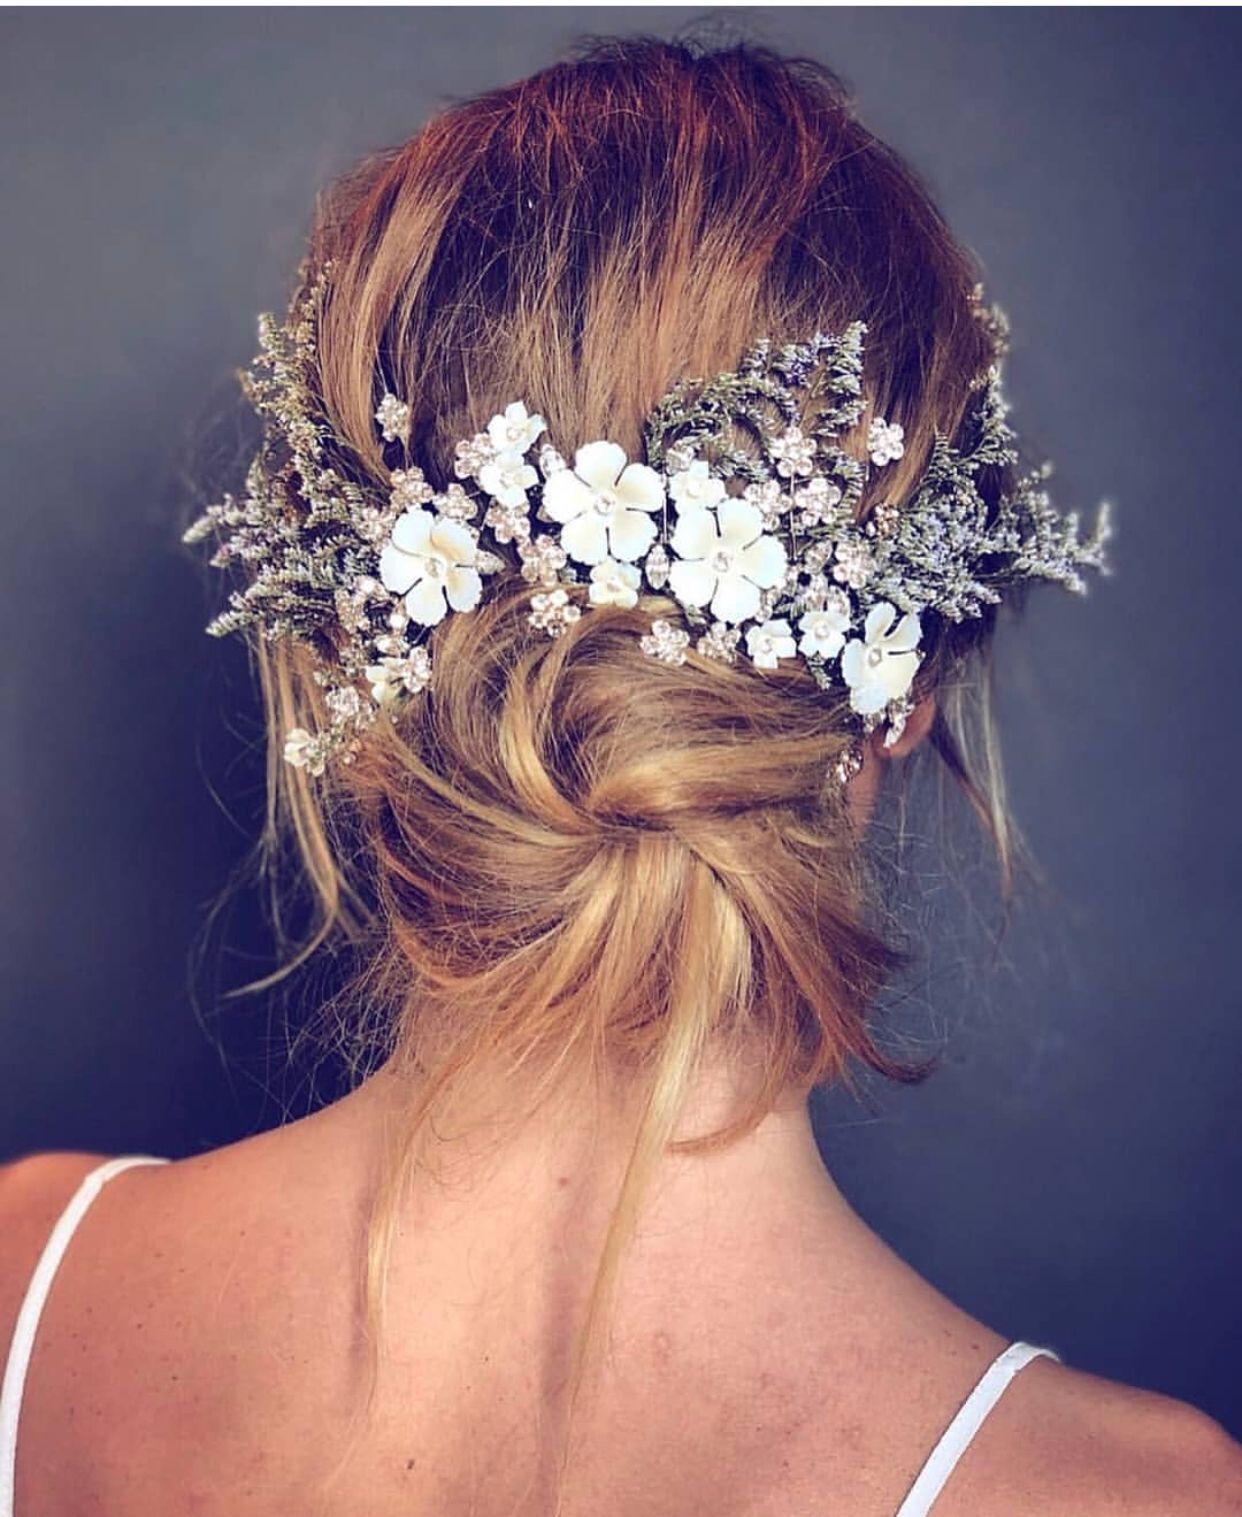 pin by sammie coco on hair | wedding hair accessories